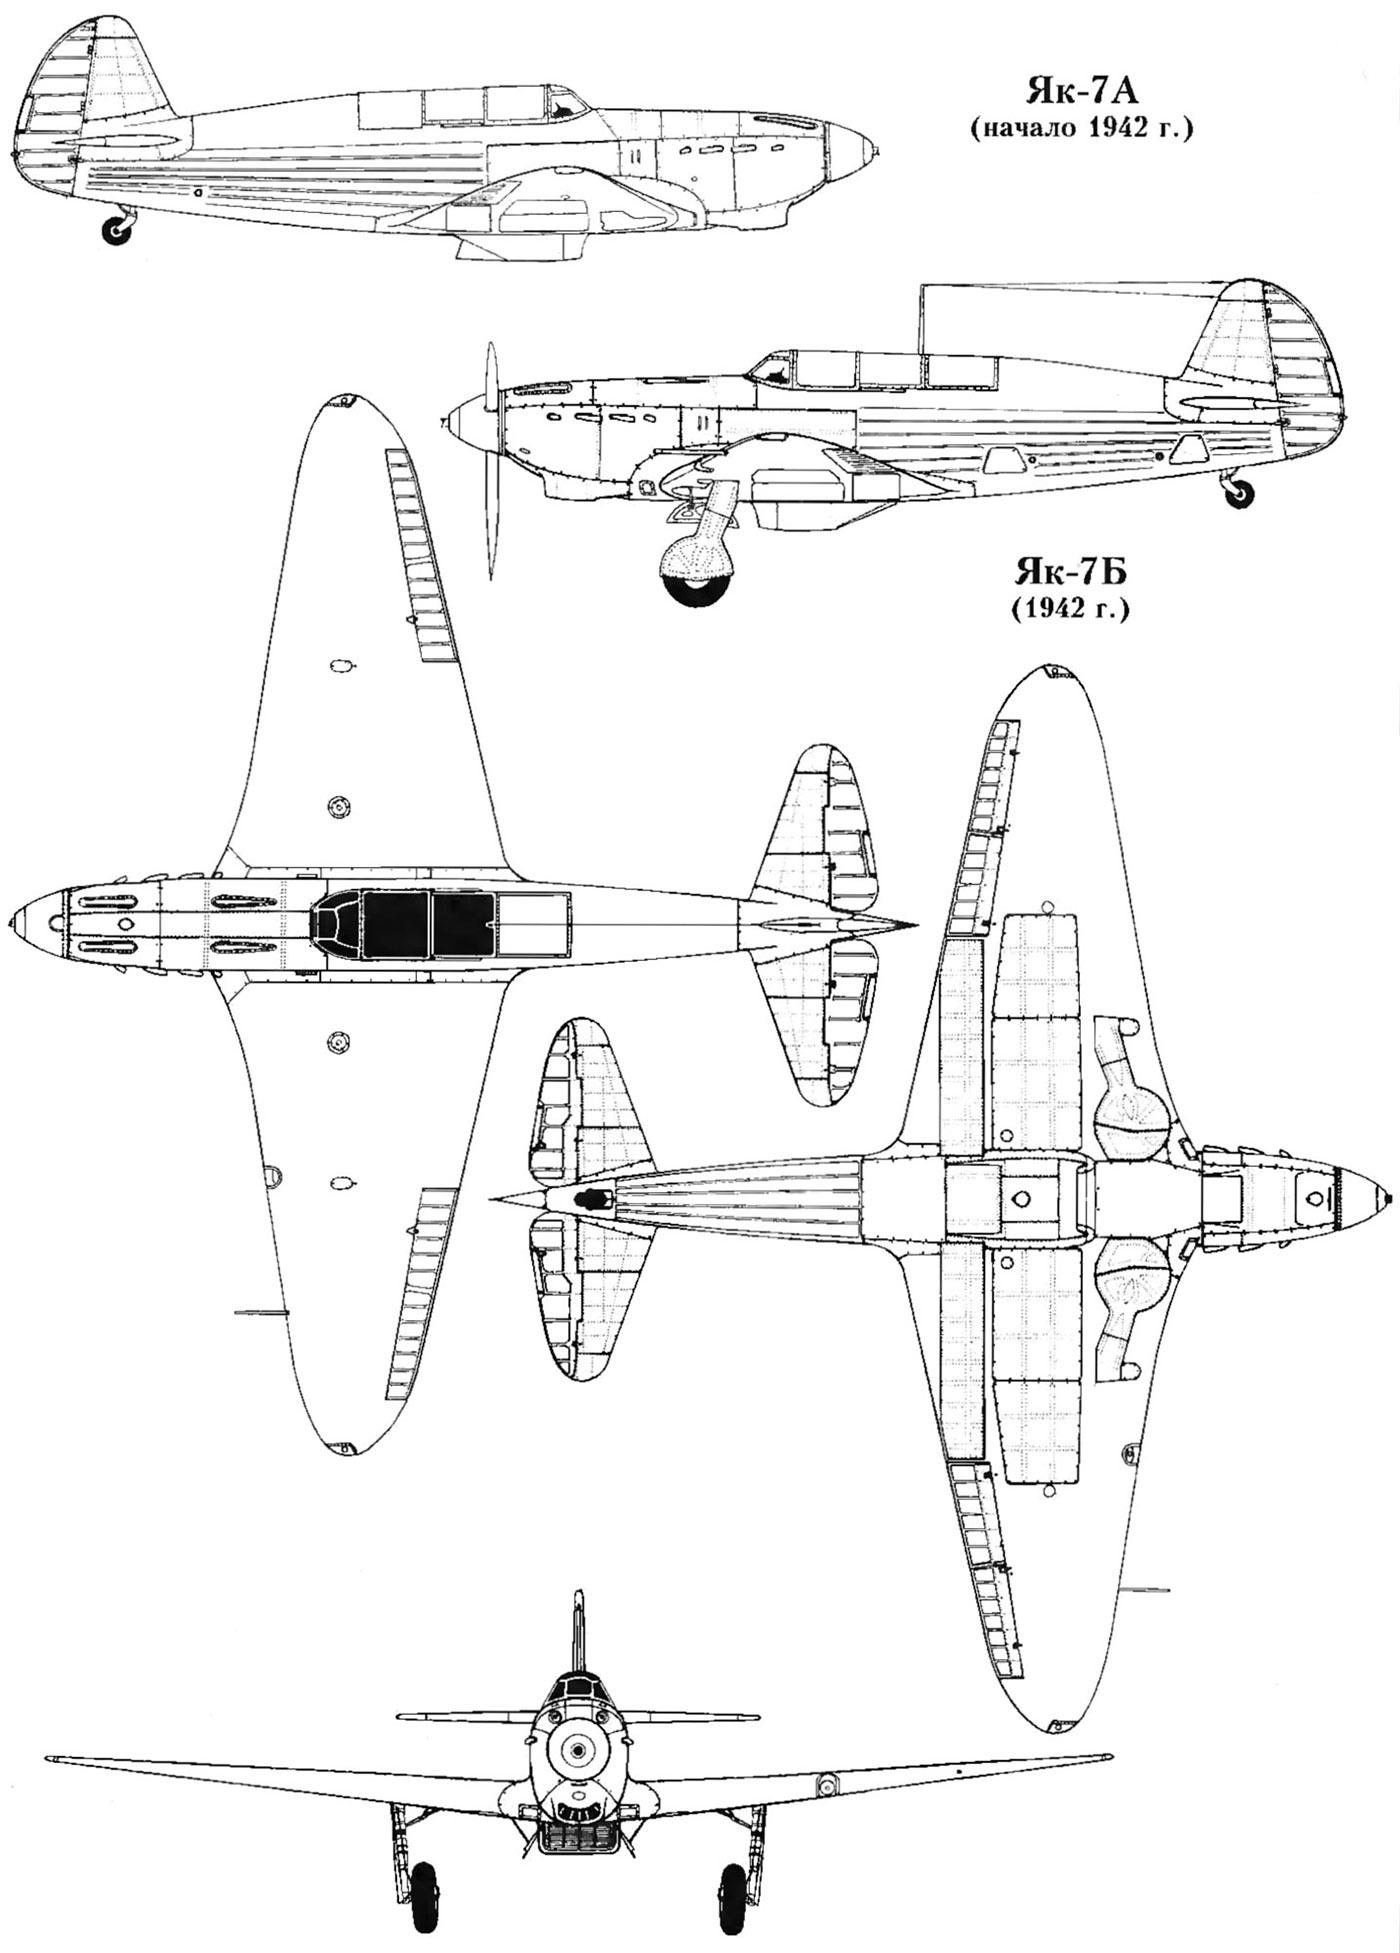 Чертеж истребителя Як-7